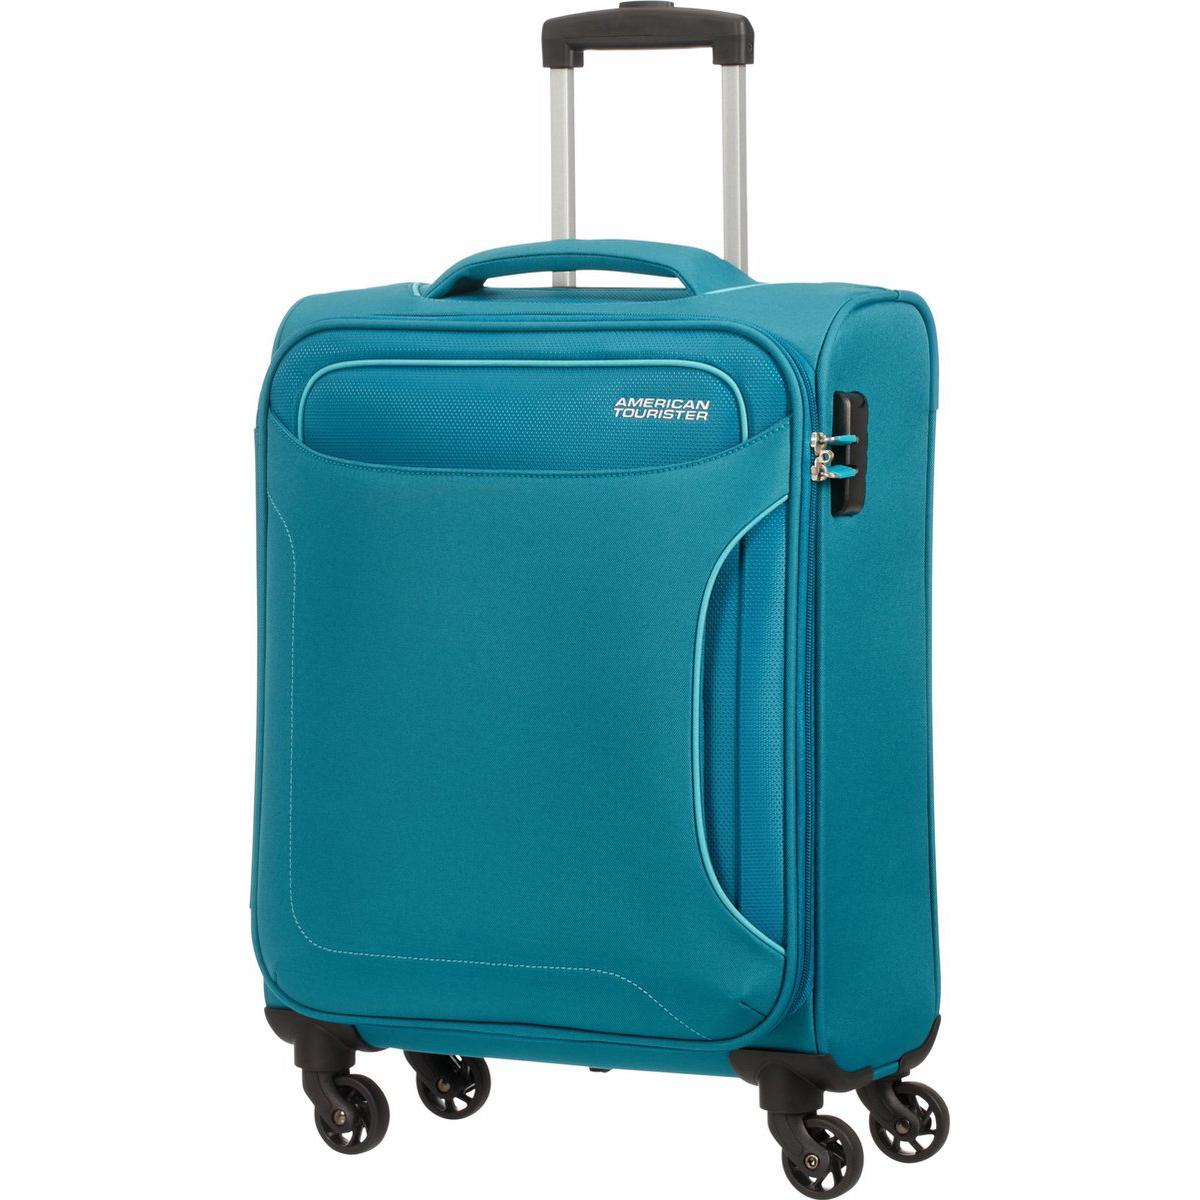 Фото - Чемодан American Tourister 4-х колесный сине-зеленый 40х20х55 см чемодан american tourister 4 х колесный бирюзовый 40х20х55 см